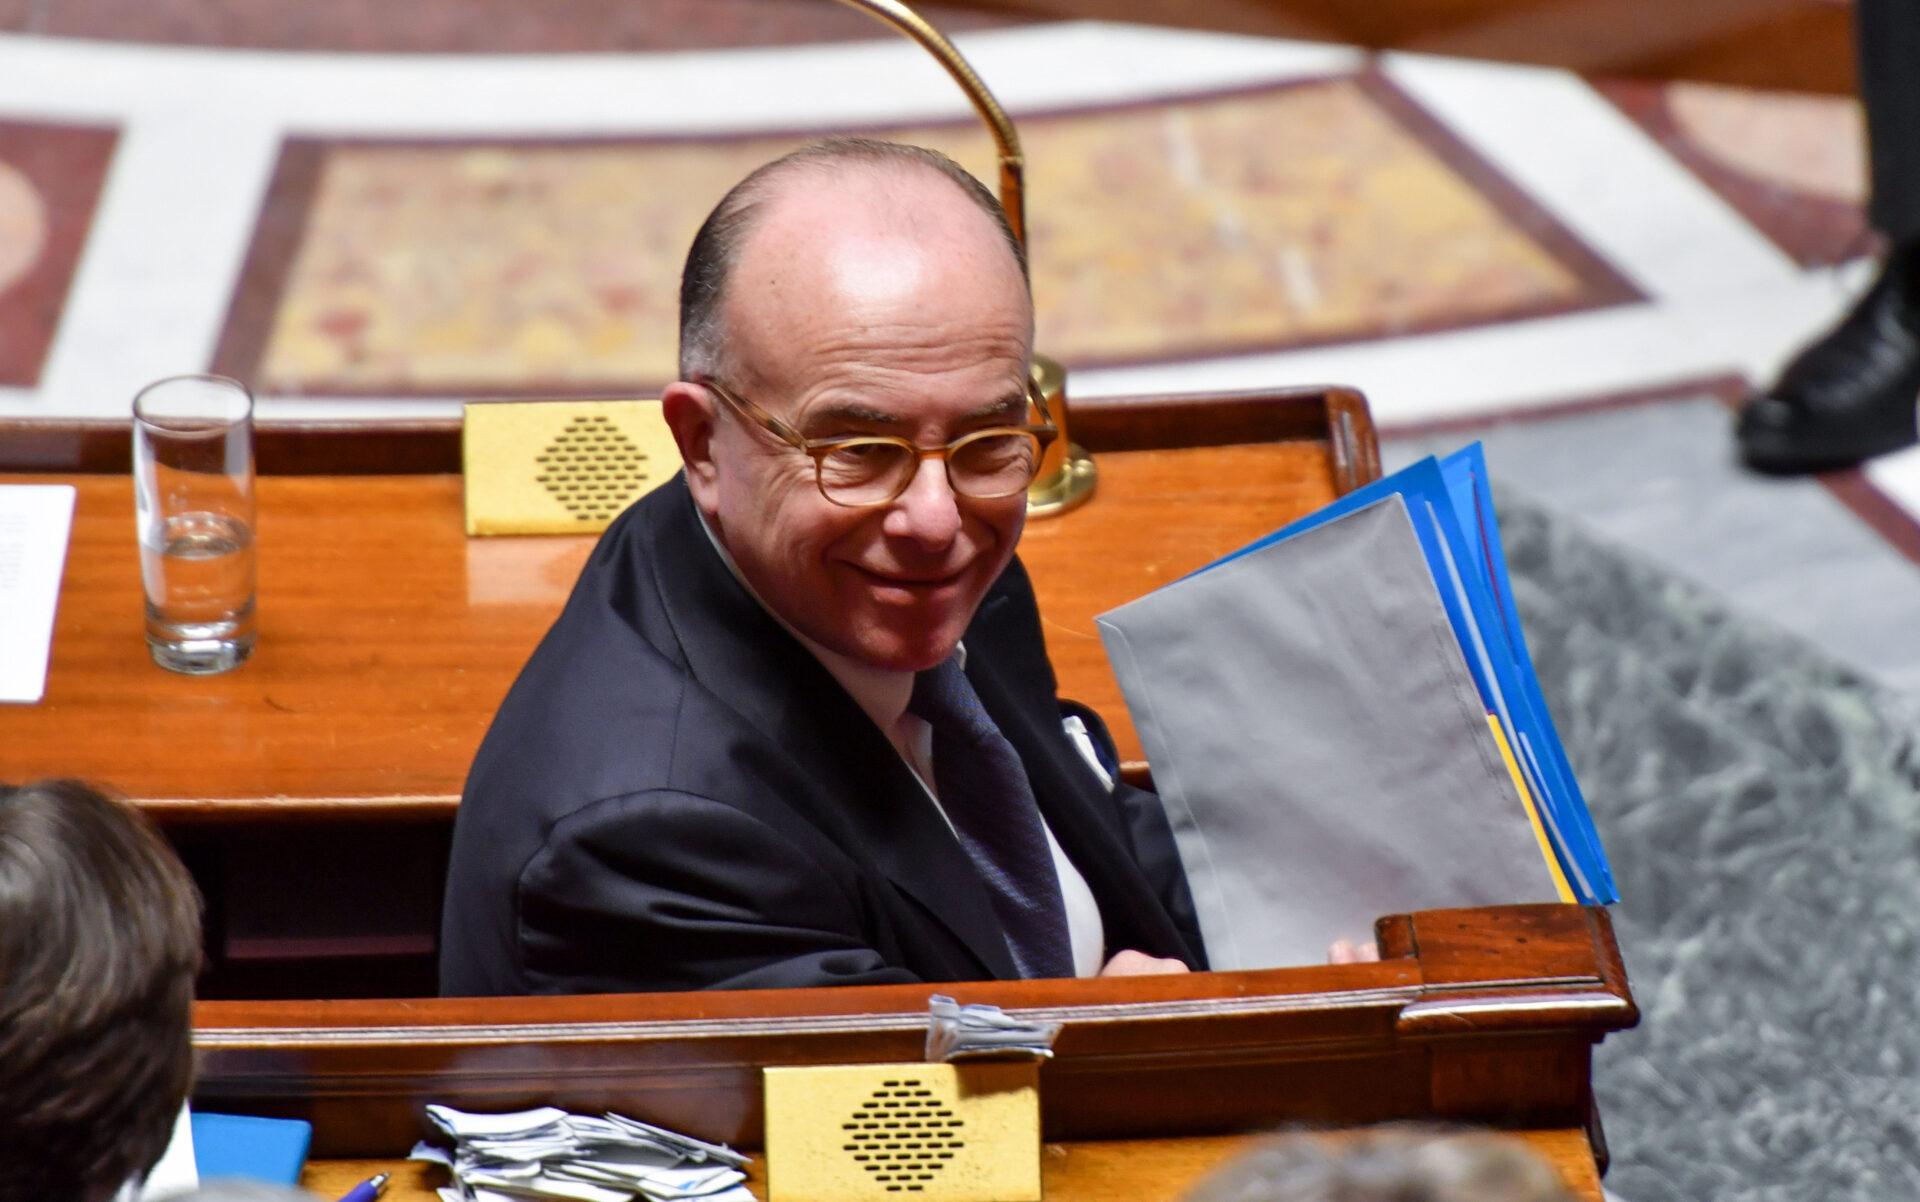 Bernard Cazeneuve au travail, Macron, Darmon 19/01/2017